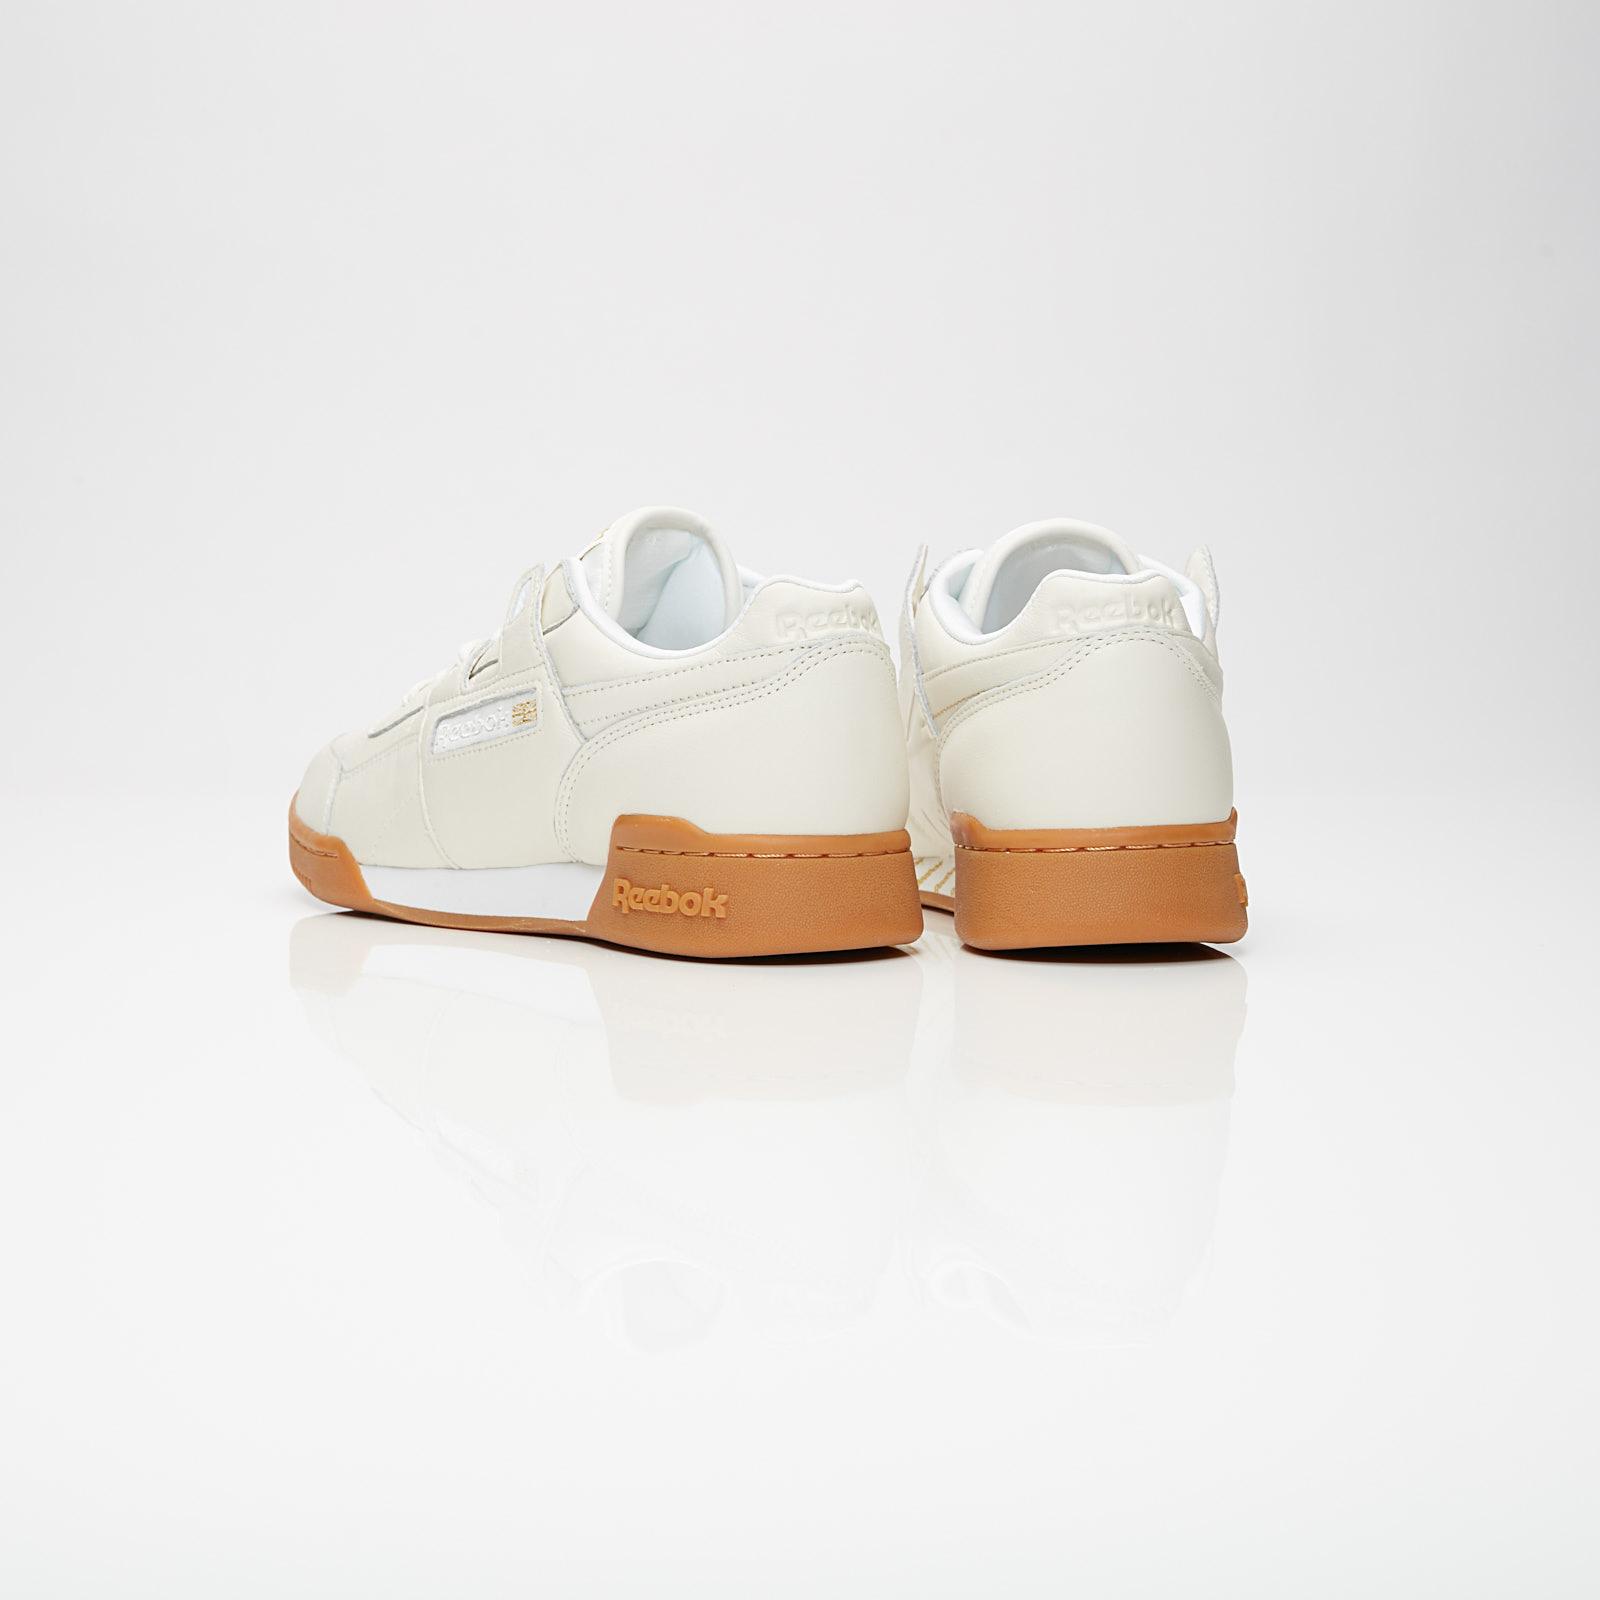 18dfc5e9371 Reebok Workout Plus MU - Cn4404 - Sneakersnstuff